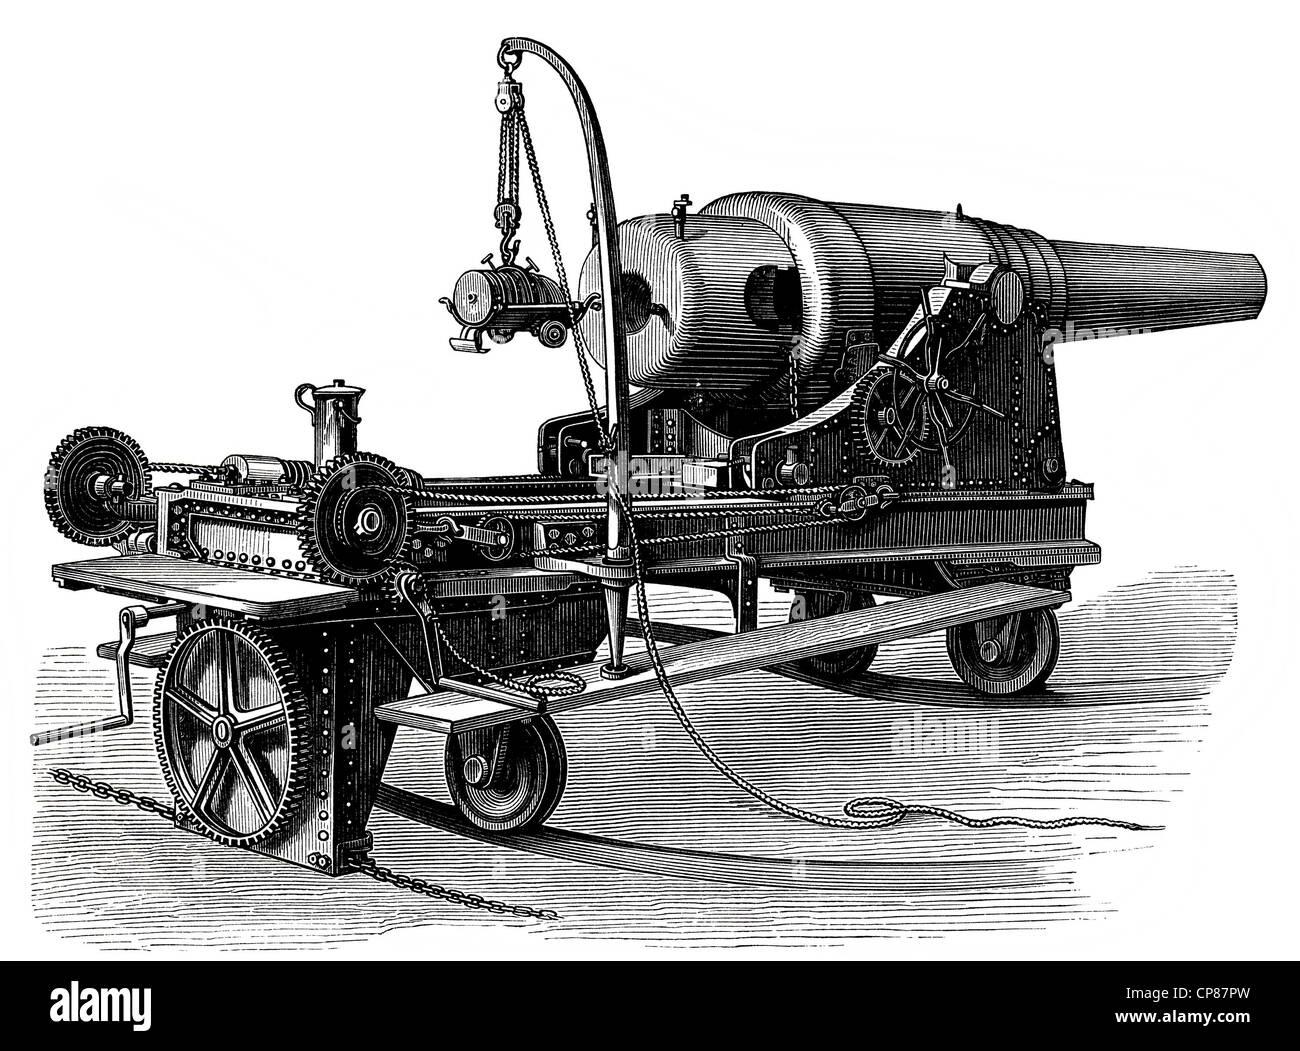 ring-mounted turret cannon from the German coastal artillery, 19th Century, Geschütze und Kanonen, Ringkanone - Stock Image